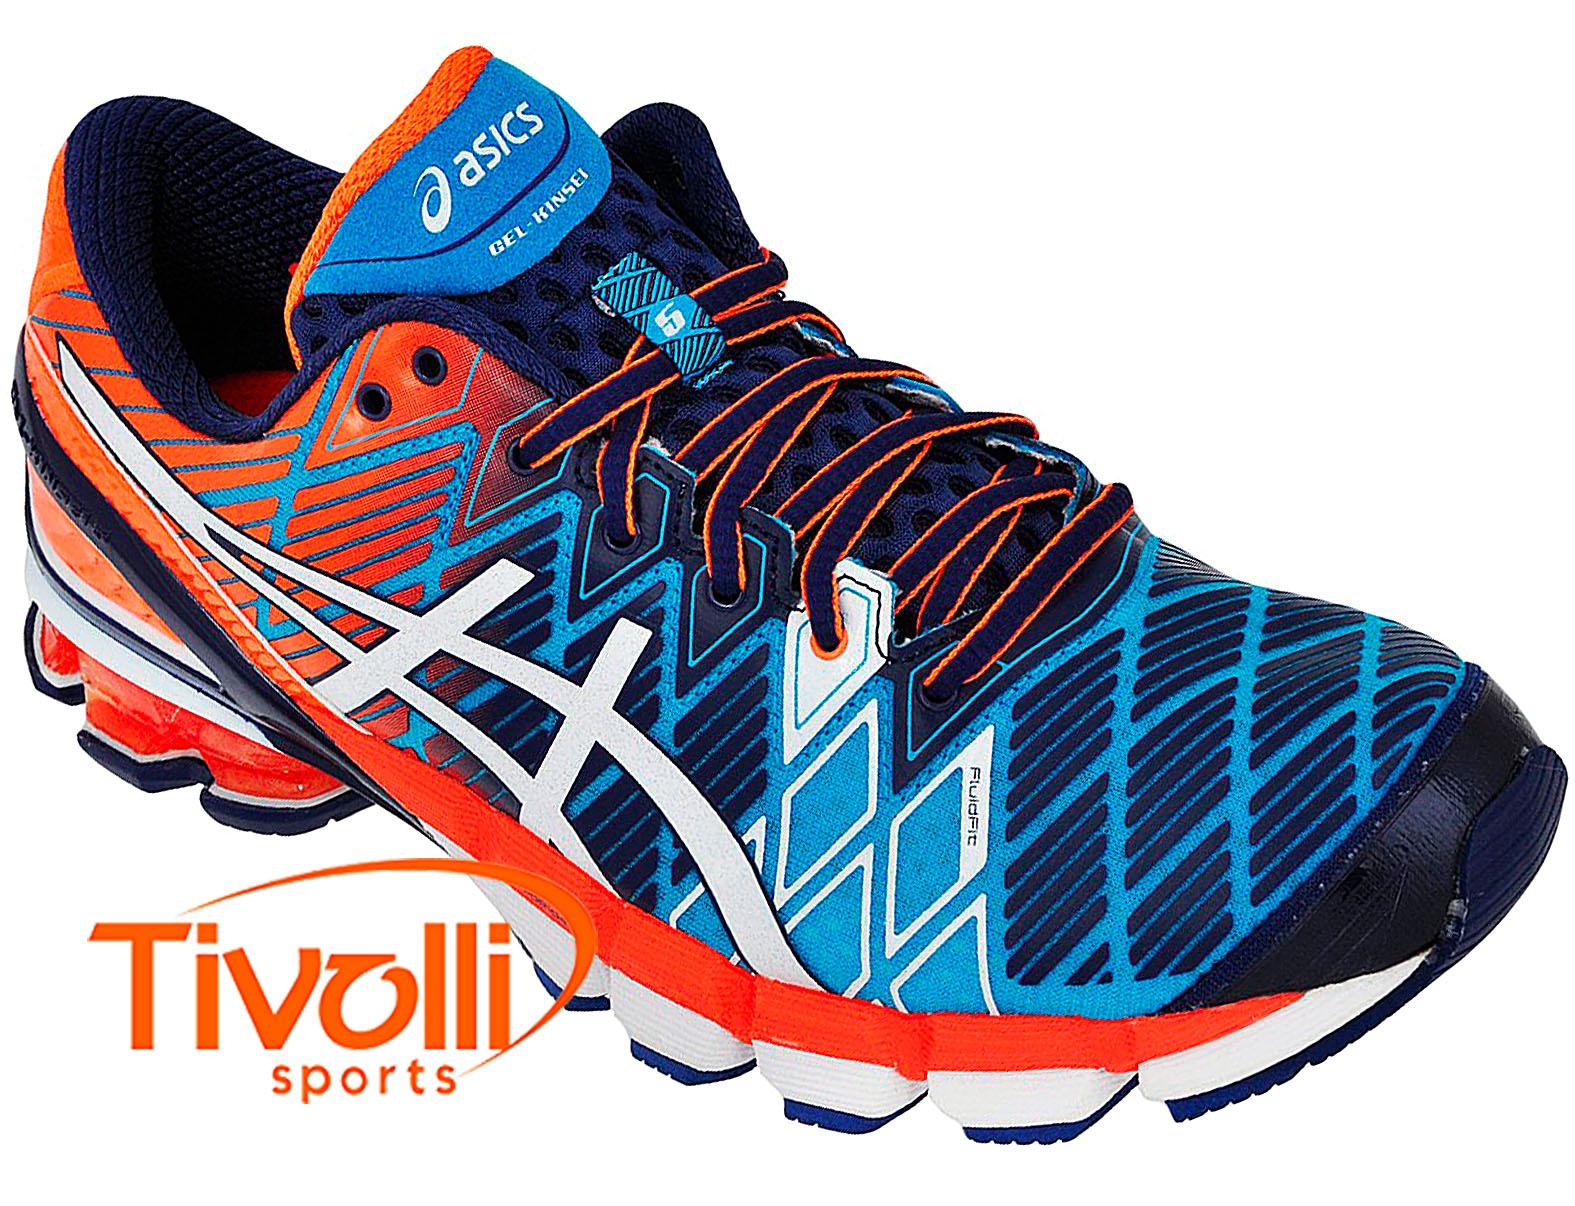 buy online 46898 723f9 Tênis Asics Gel Kinsei 5 masculino marinho, laranja e branco